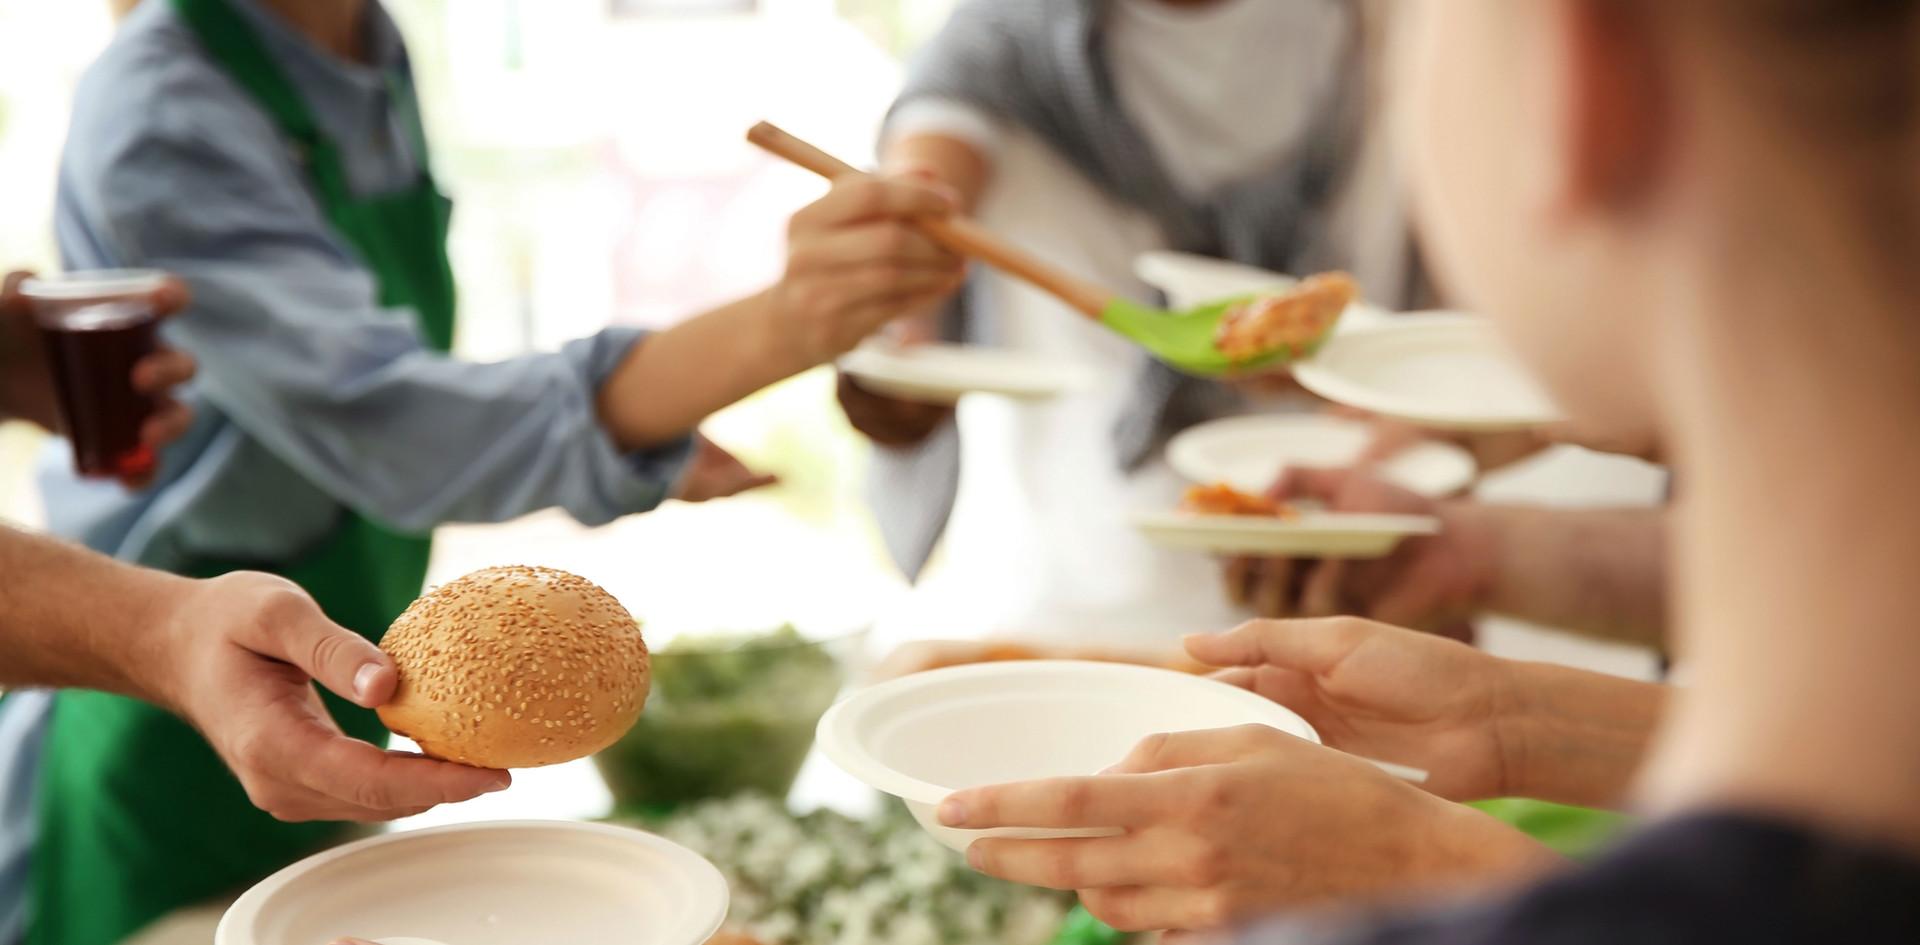 Personnes servant de la nourriture